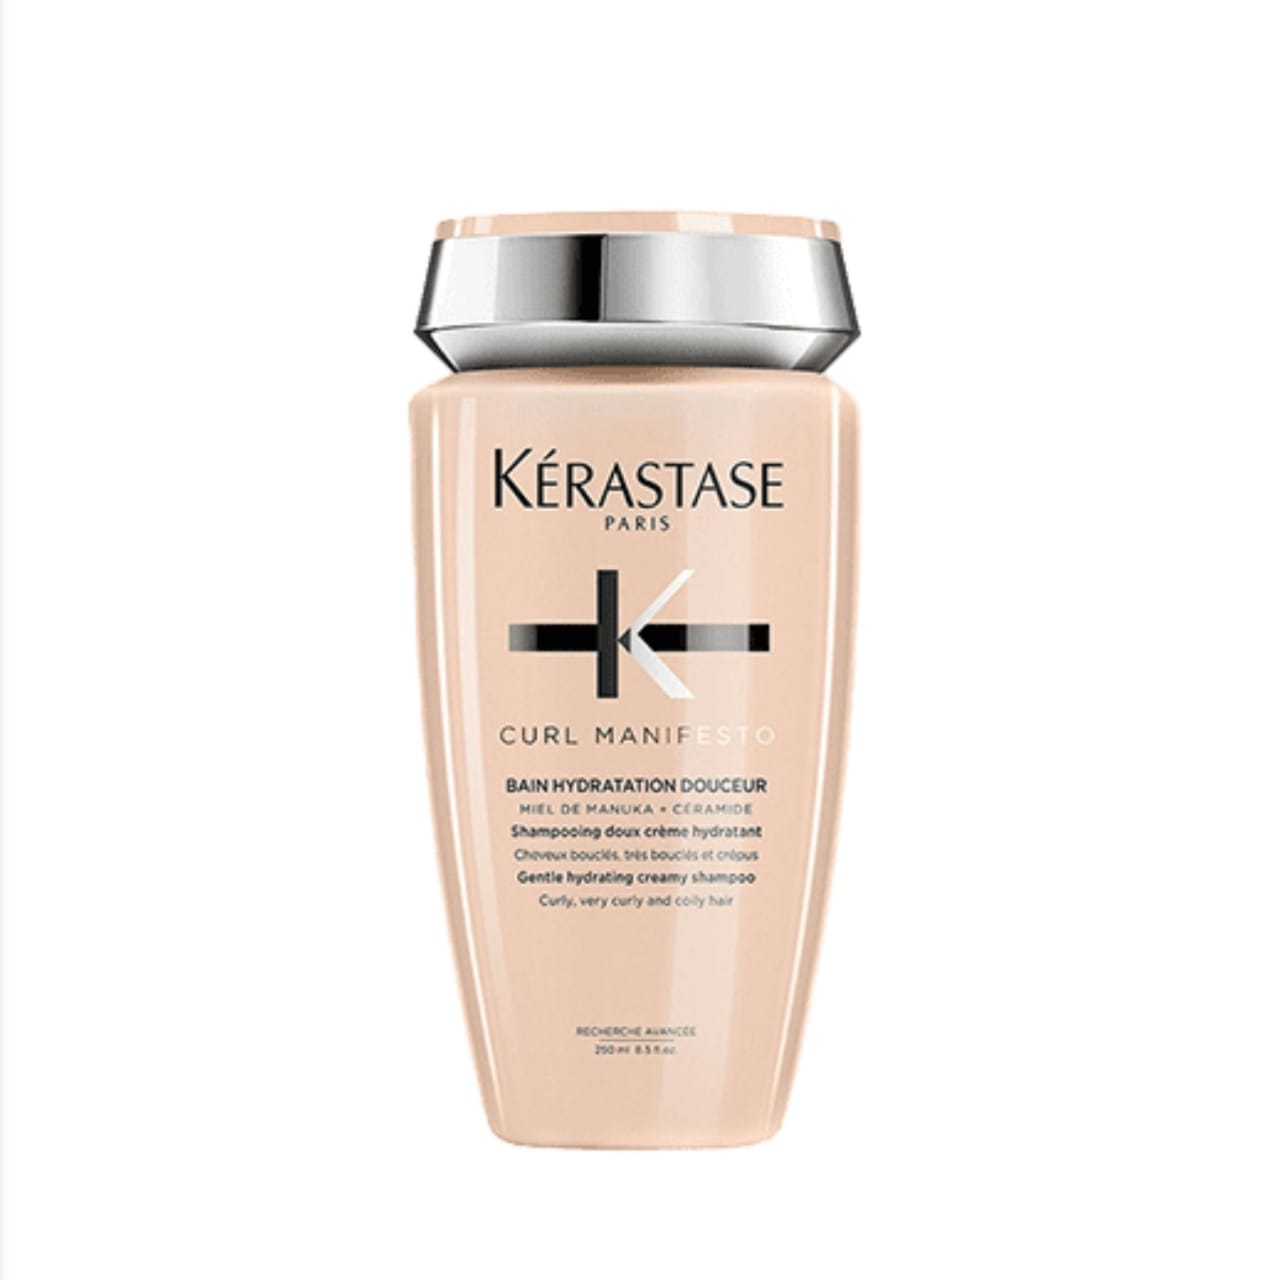 kerastase Curl Manifesto Bain Hydratation Douceur- Shampoo 250ml